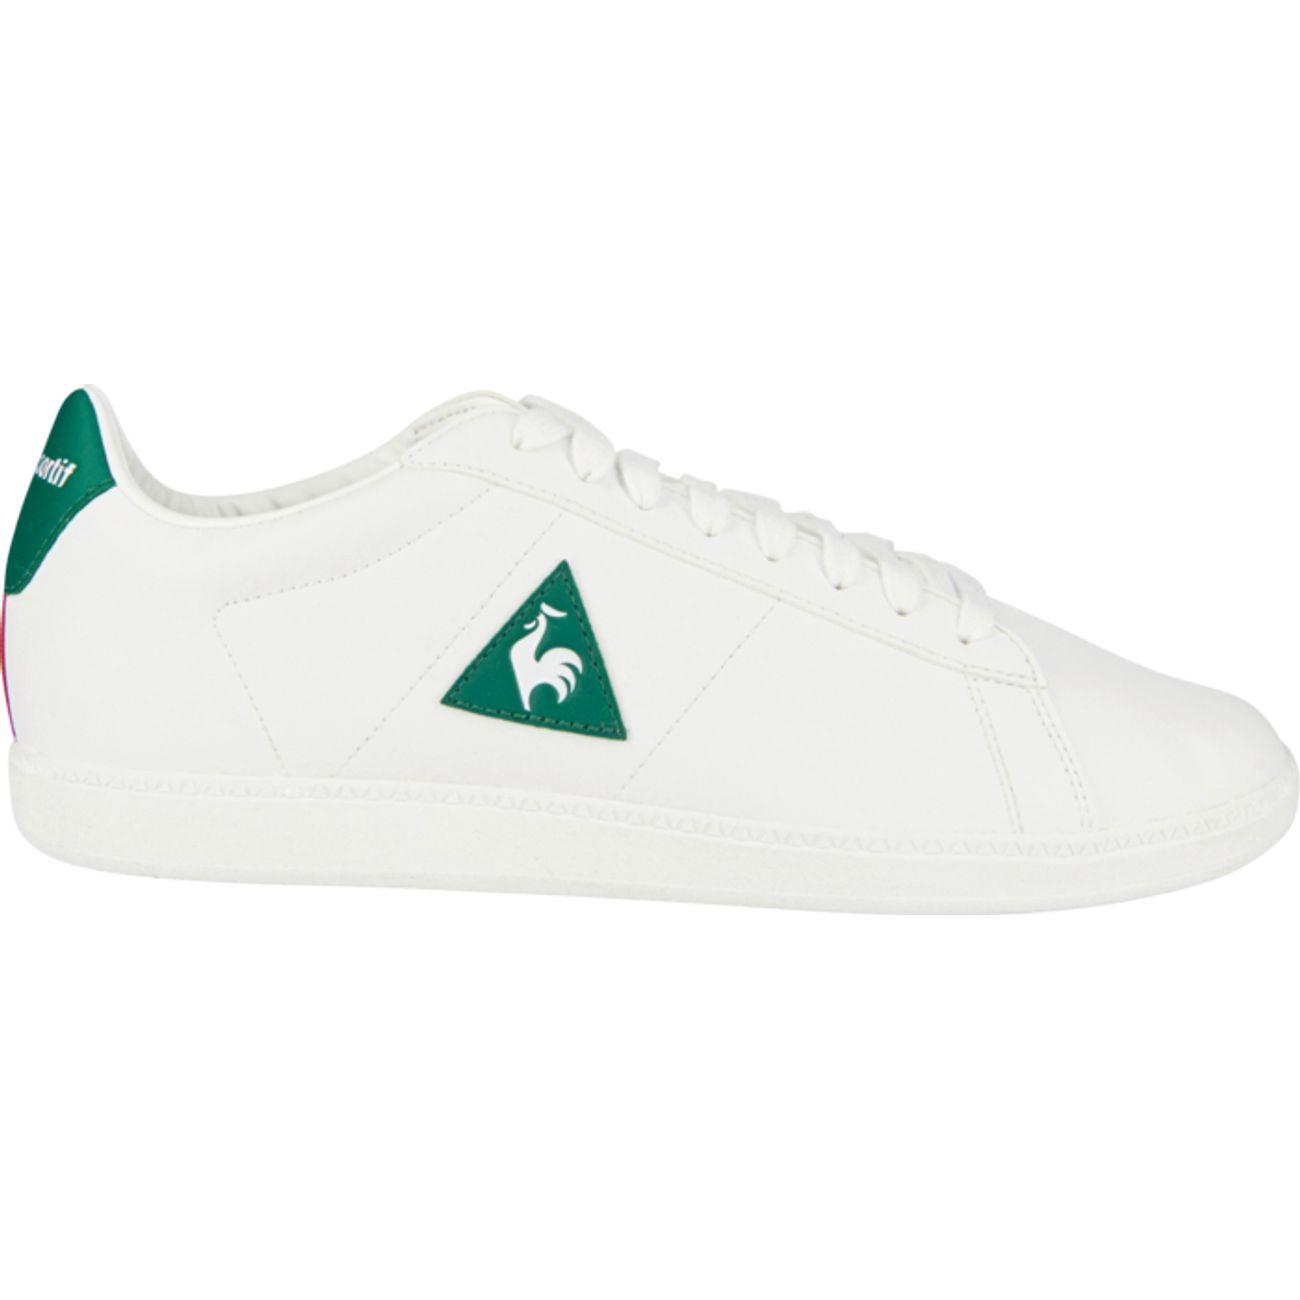 Chaussures homme Baskets Le Coq Sportif Courtset S Lea h8J9myF